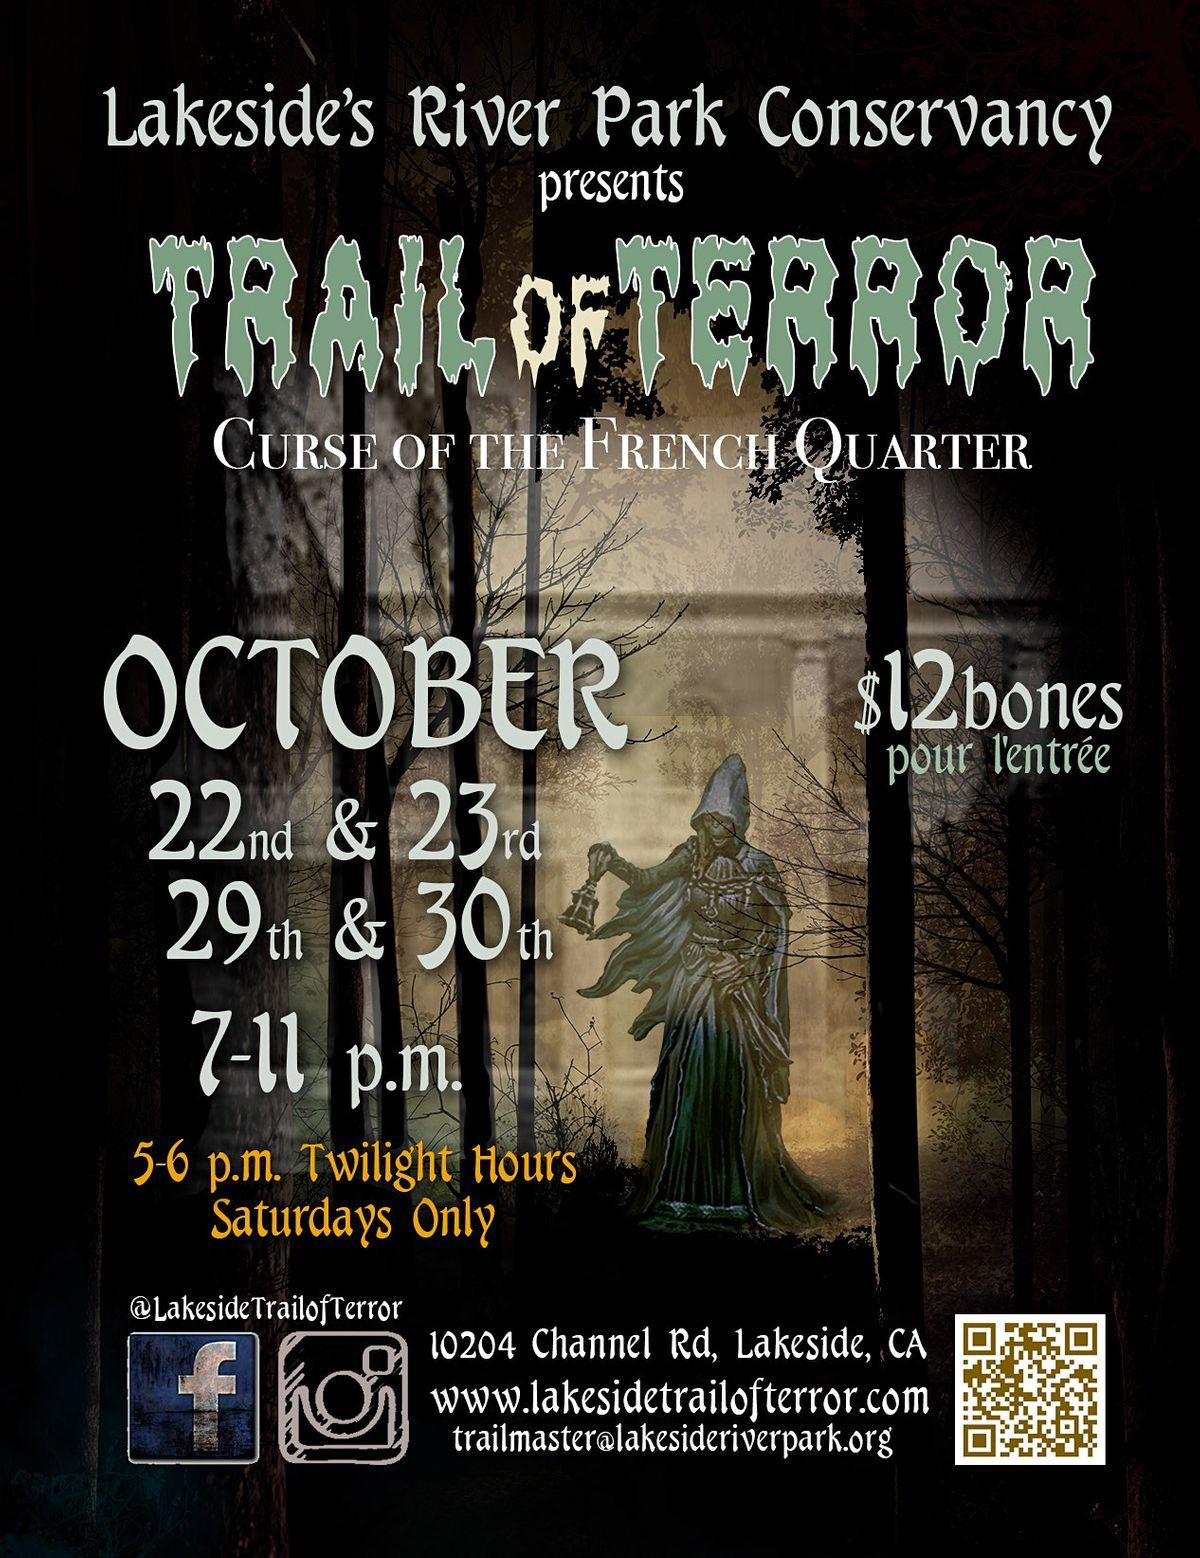 LRPC Lakeside Trail of Terror